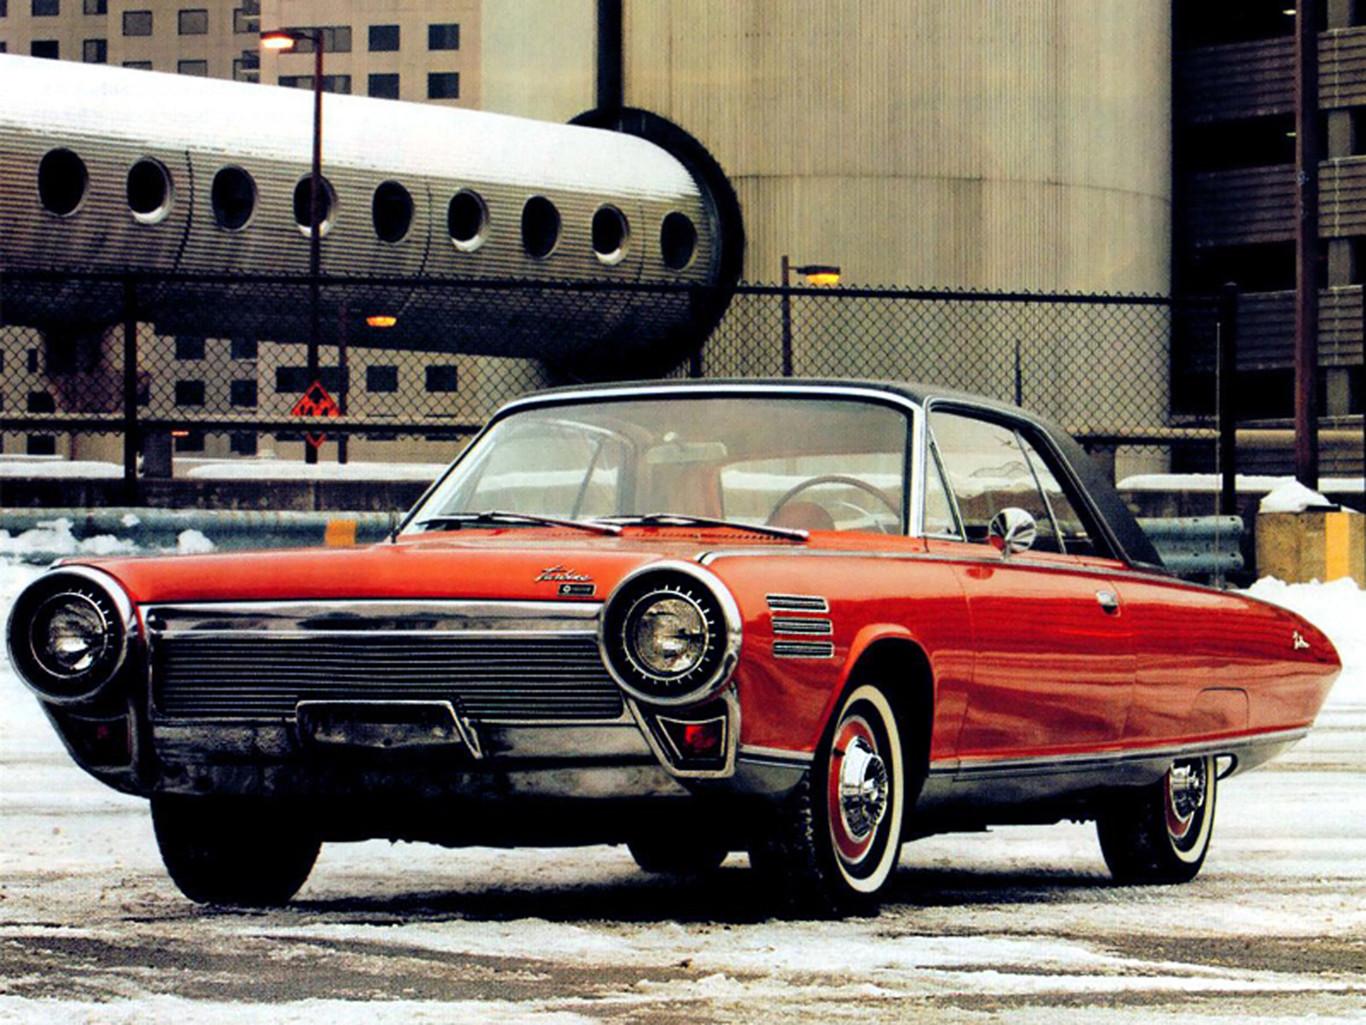 1964 Chrysler Turbine Car Interior